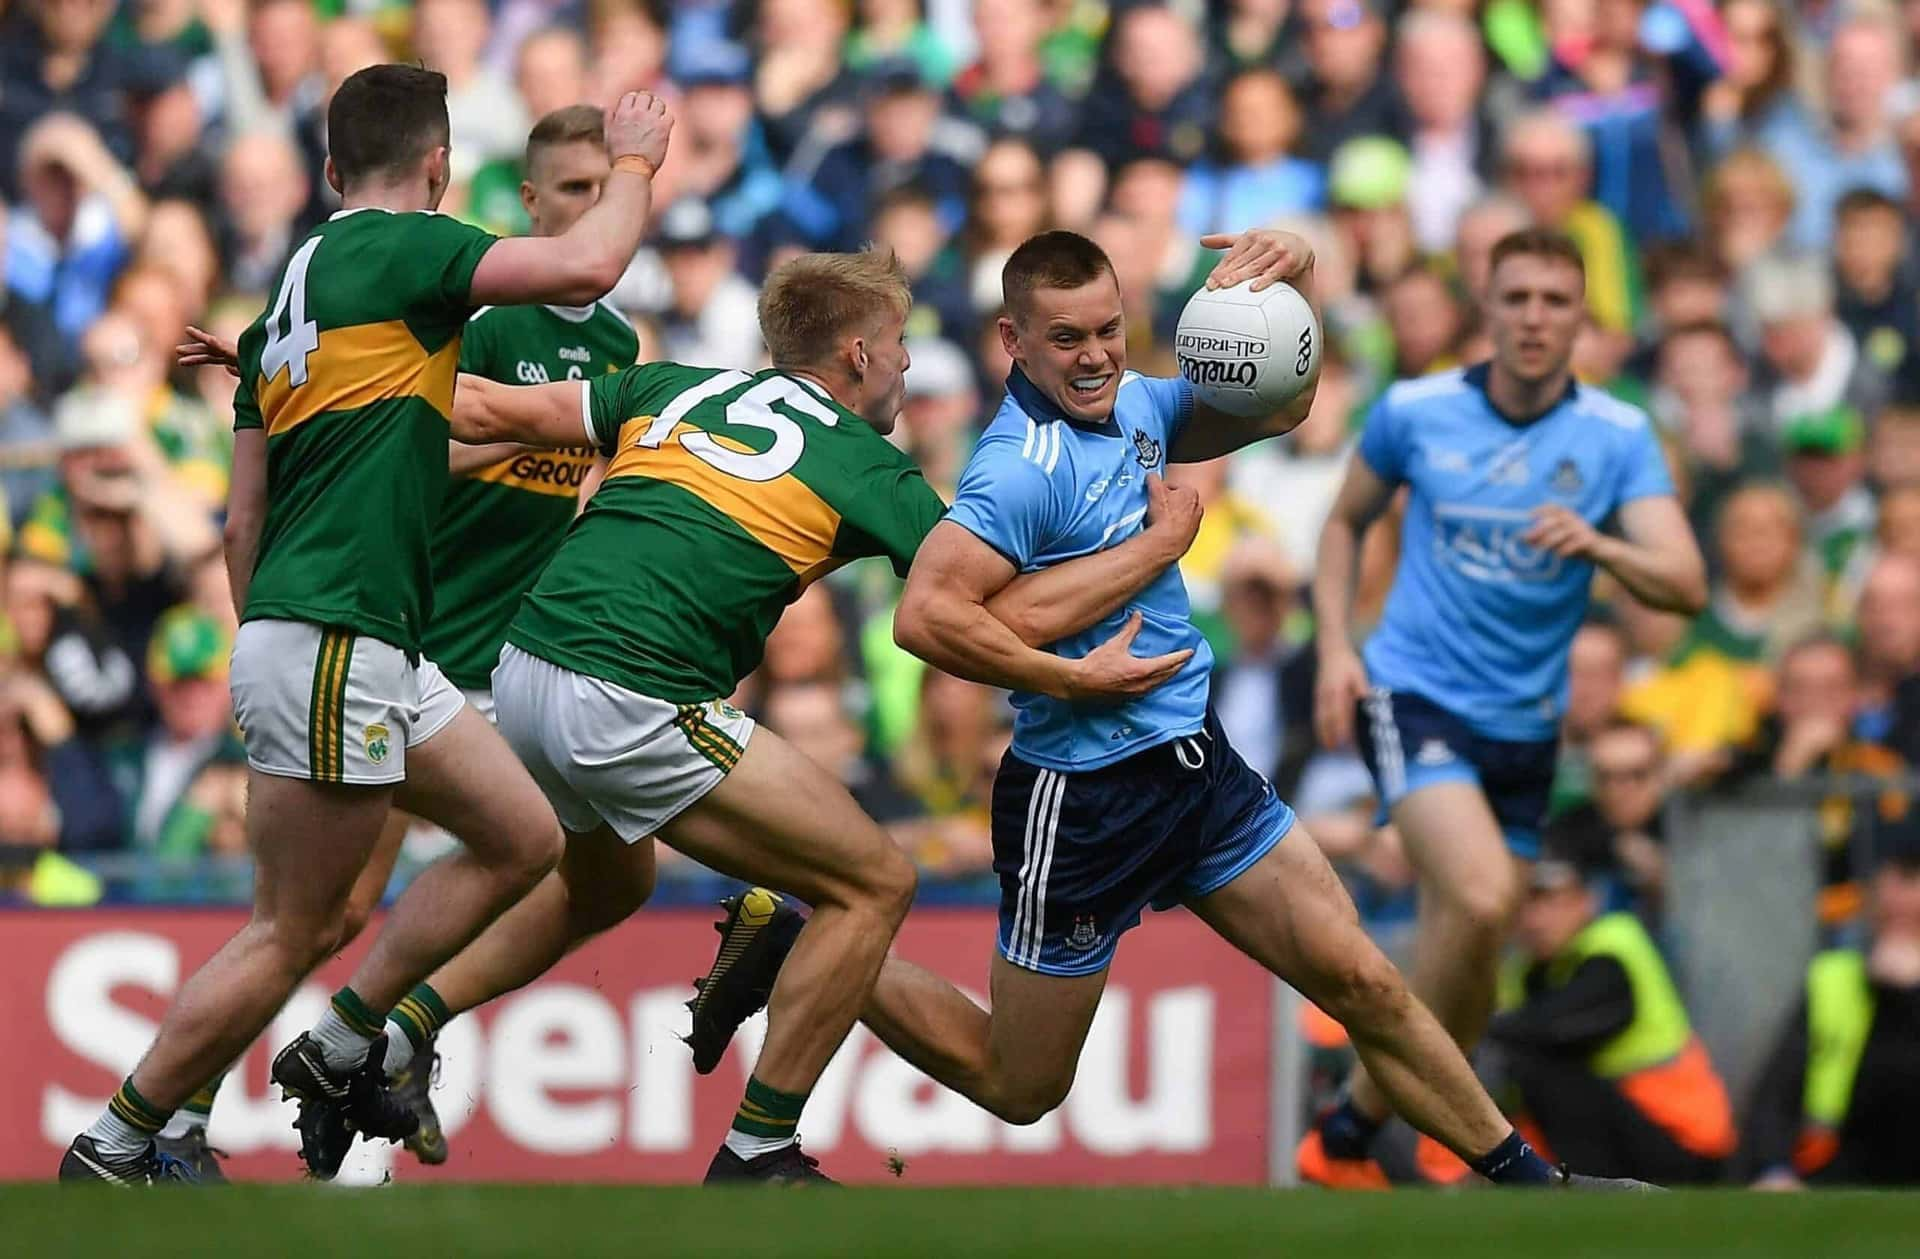 All Ireland Final vs Dublin finishes level